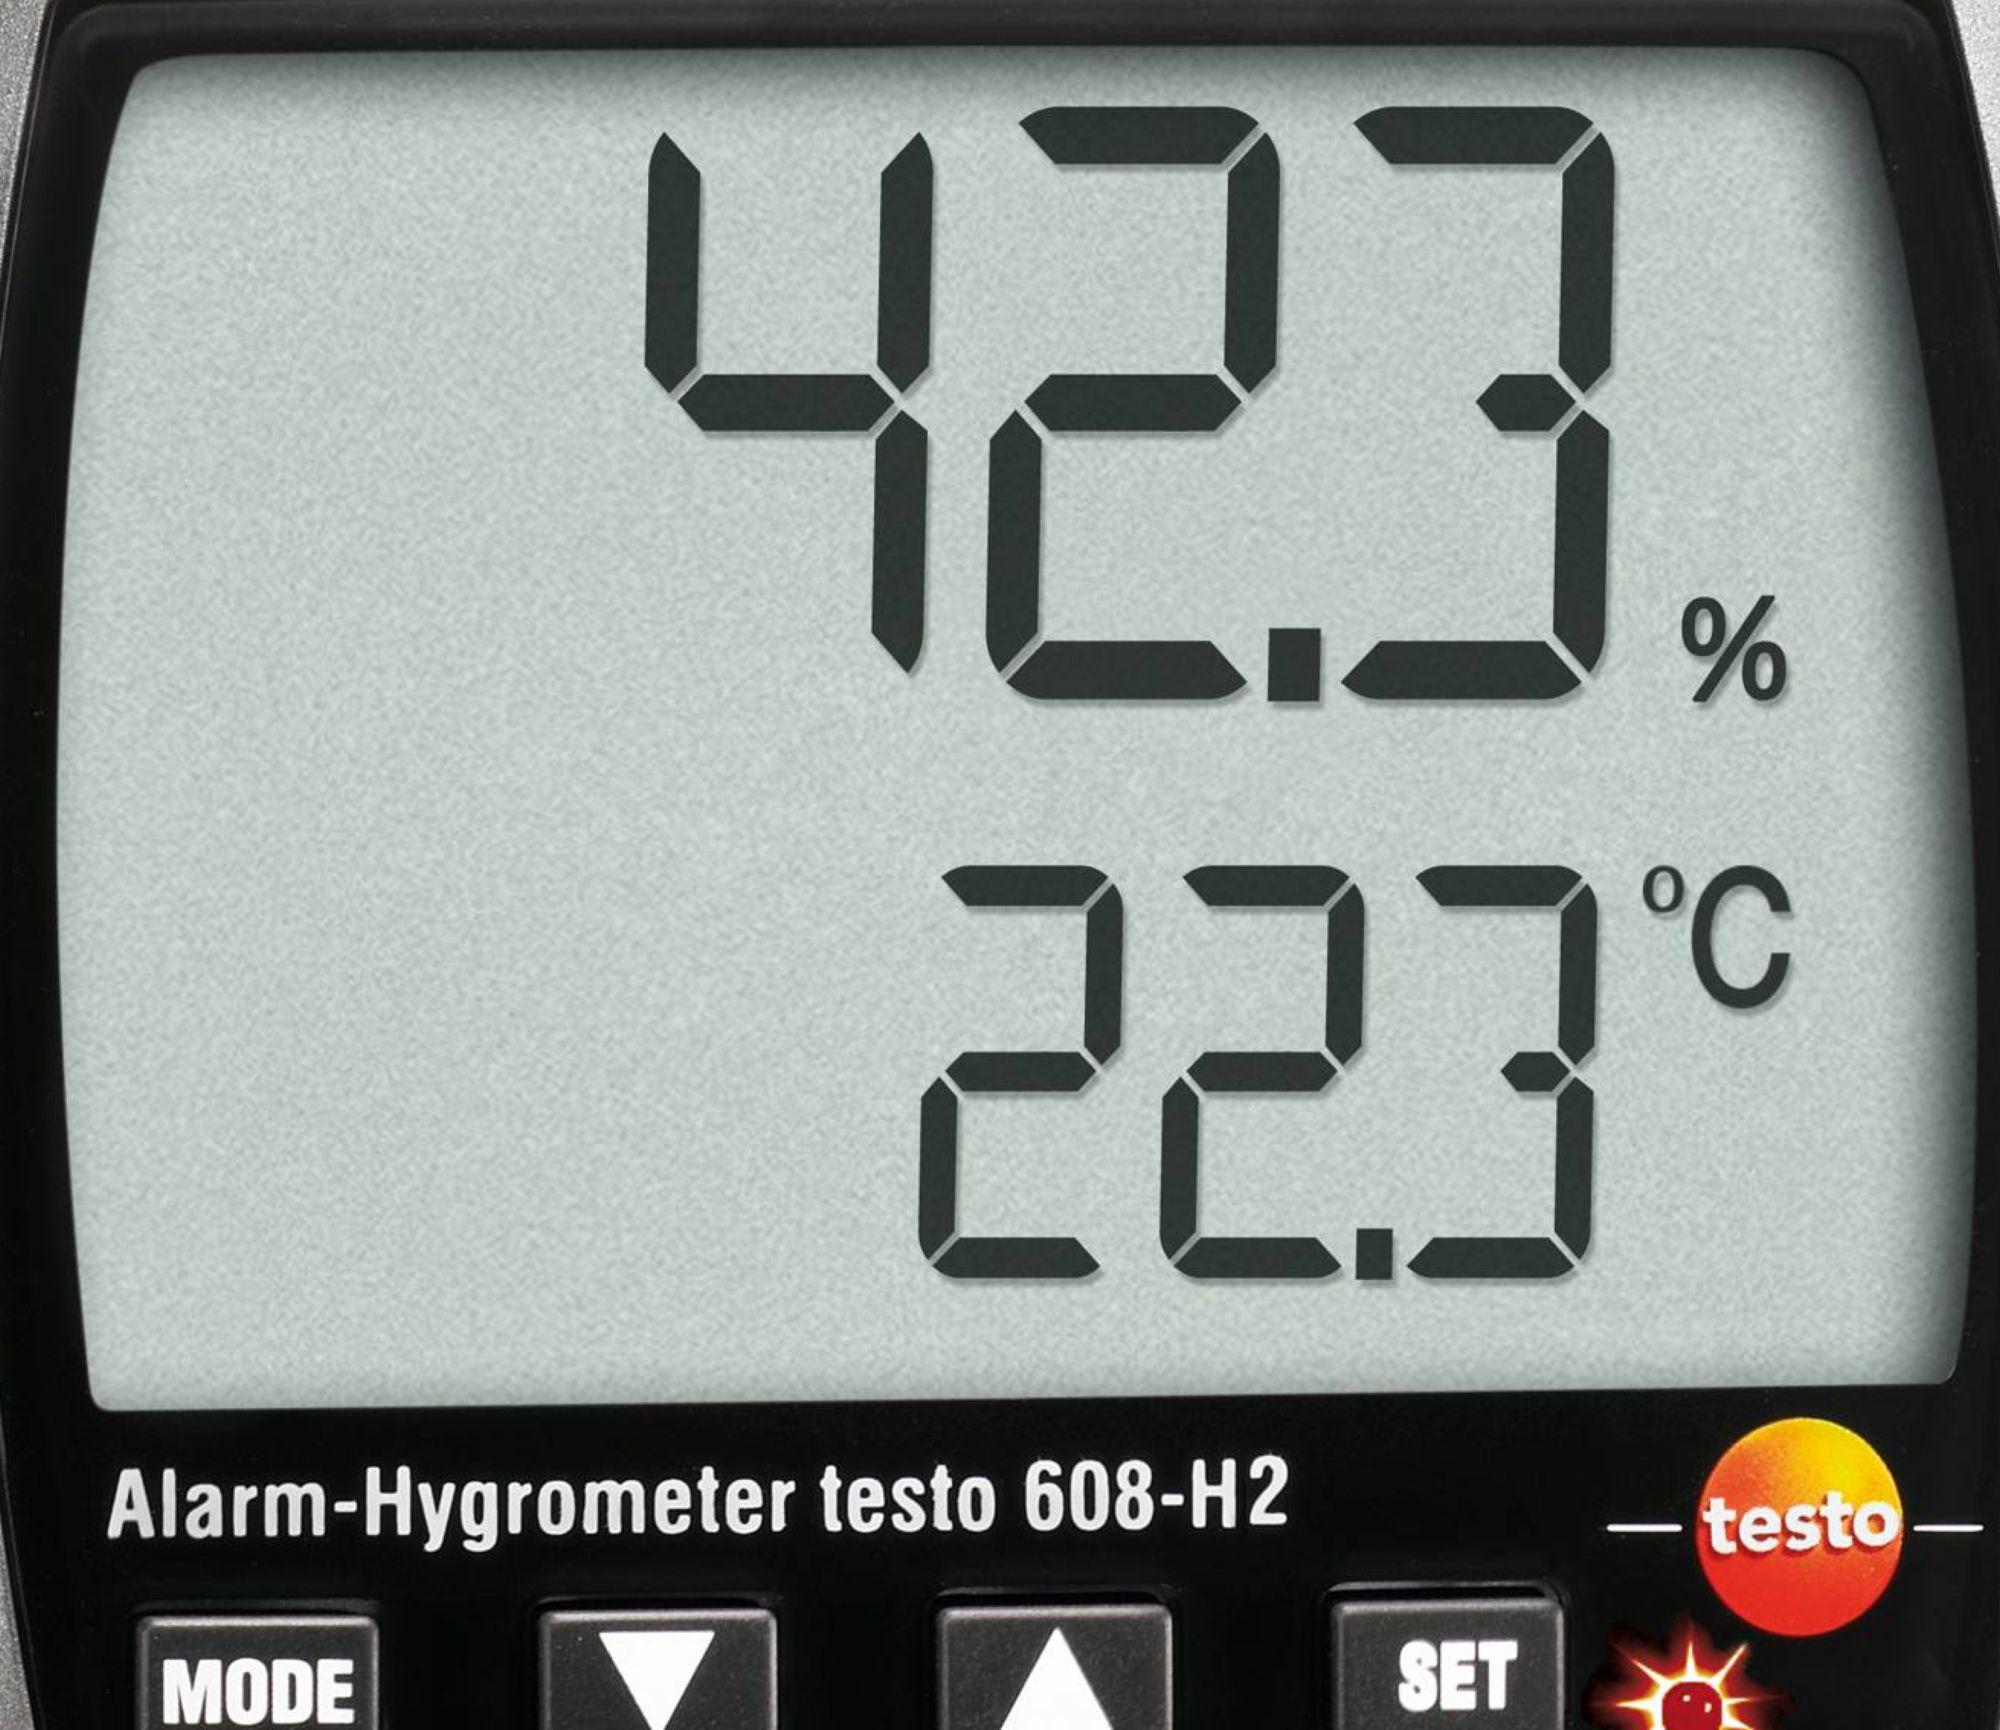 testo 608-H2 thermo hygrometer